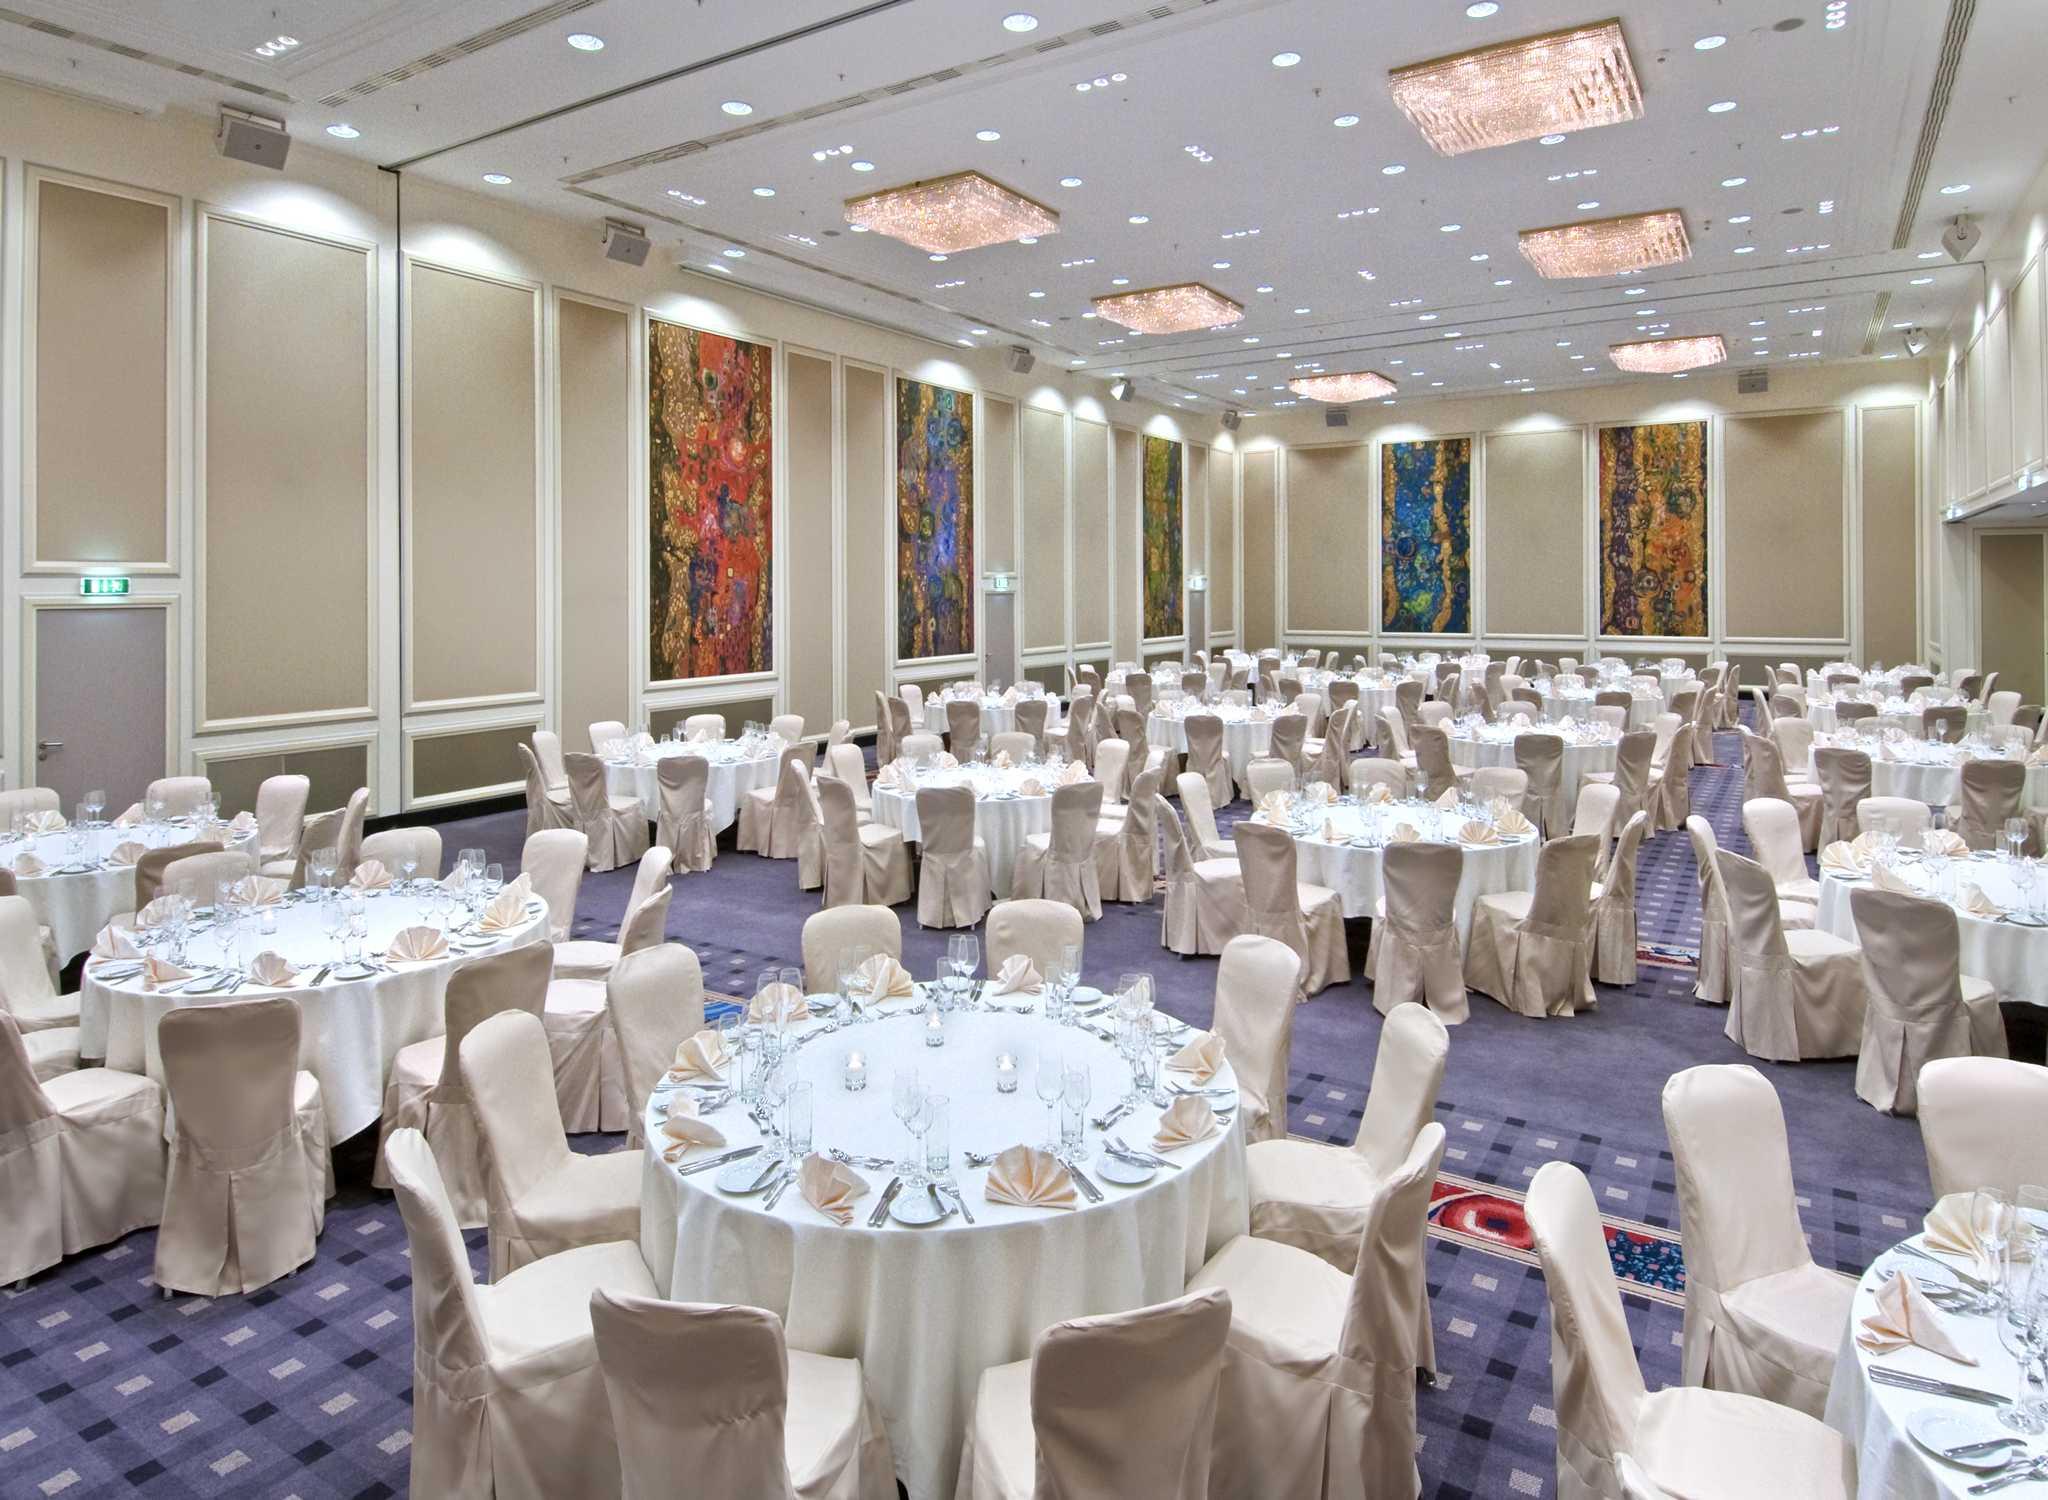 Meeting and event spaces at hilton austria hotels vienna and - H Tel Hilton Vienna Vienne Autriche Salle De R Ception